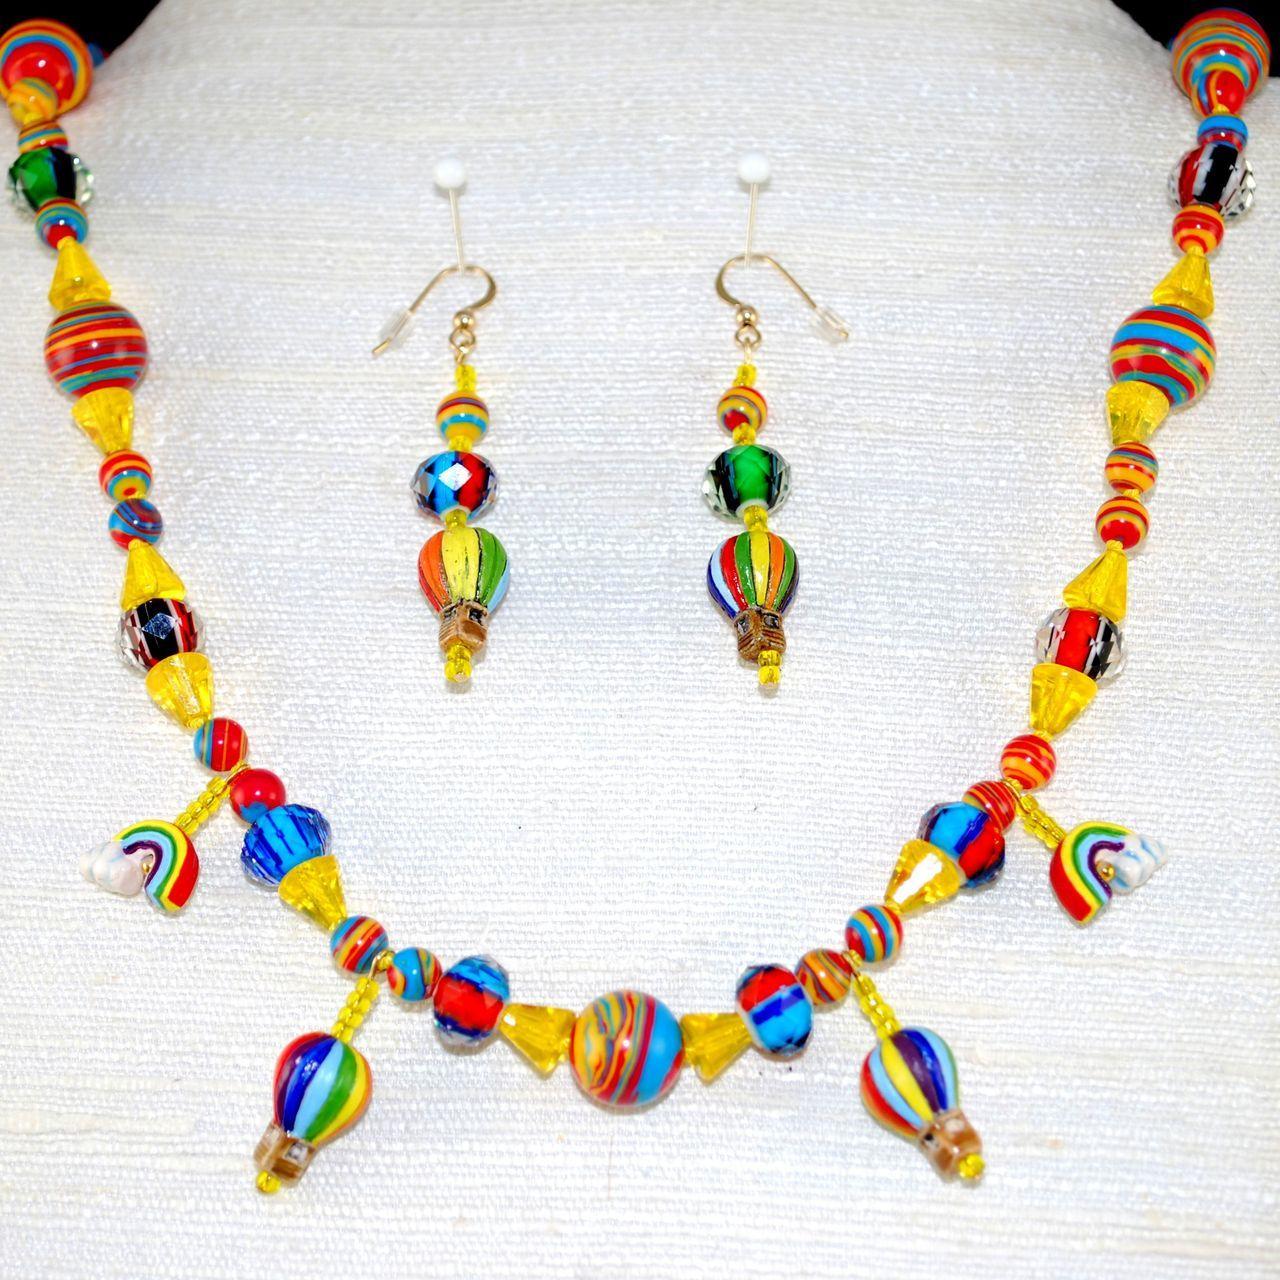 Enchanting Jewelry Creations